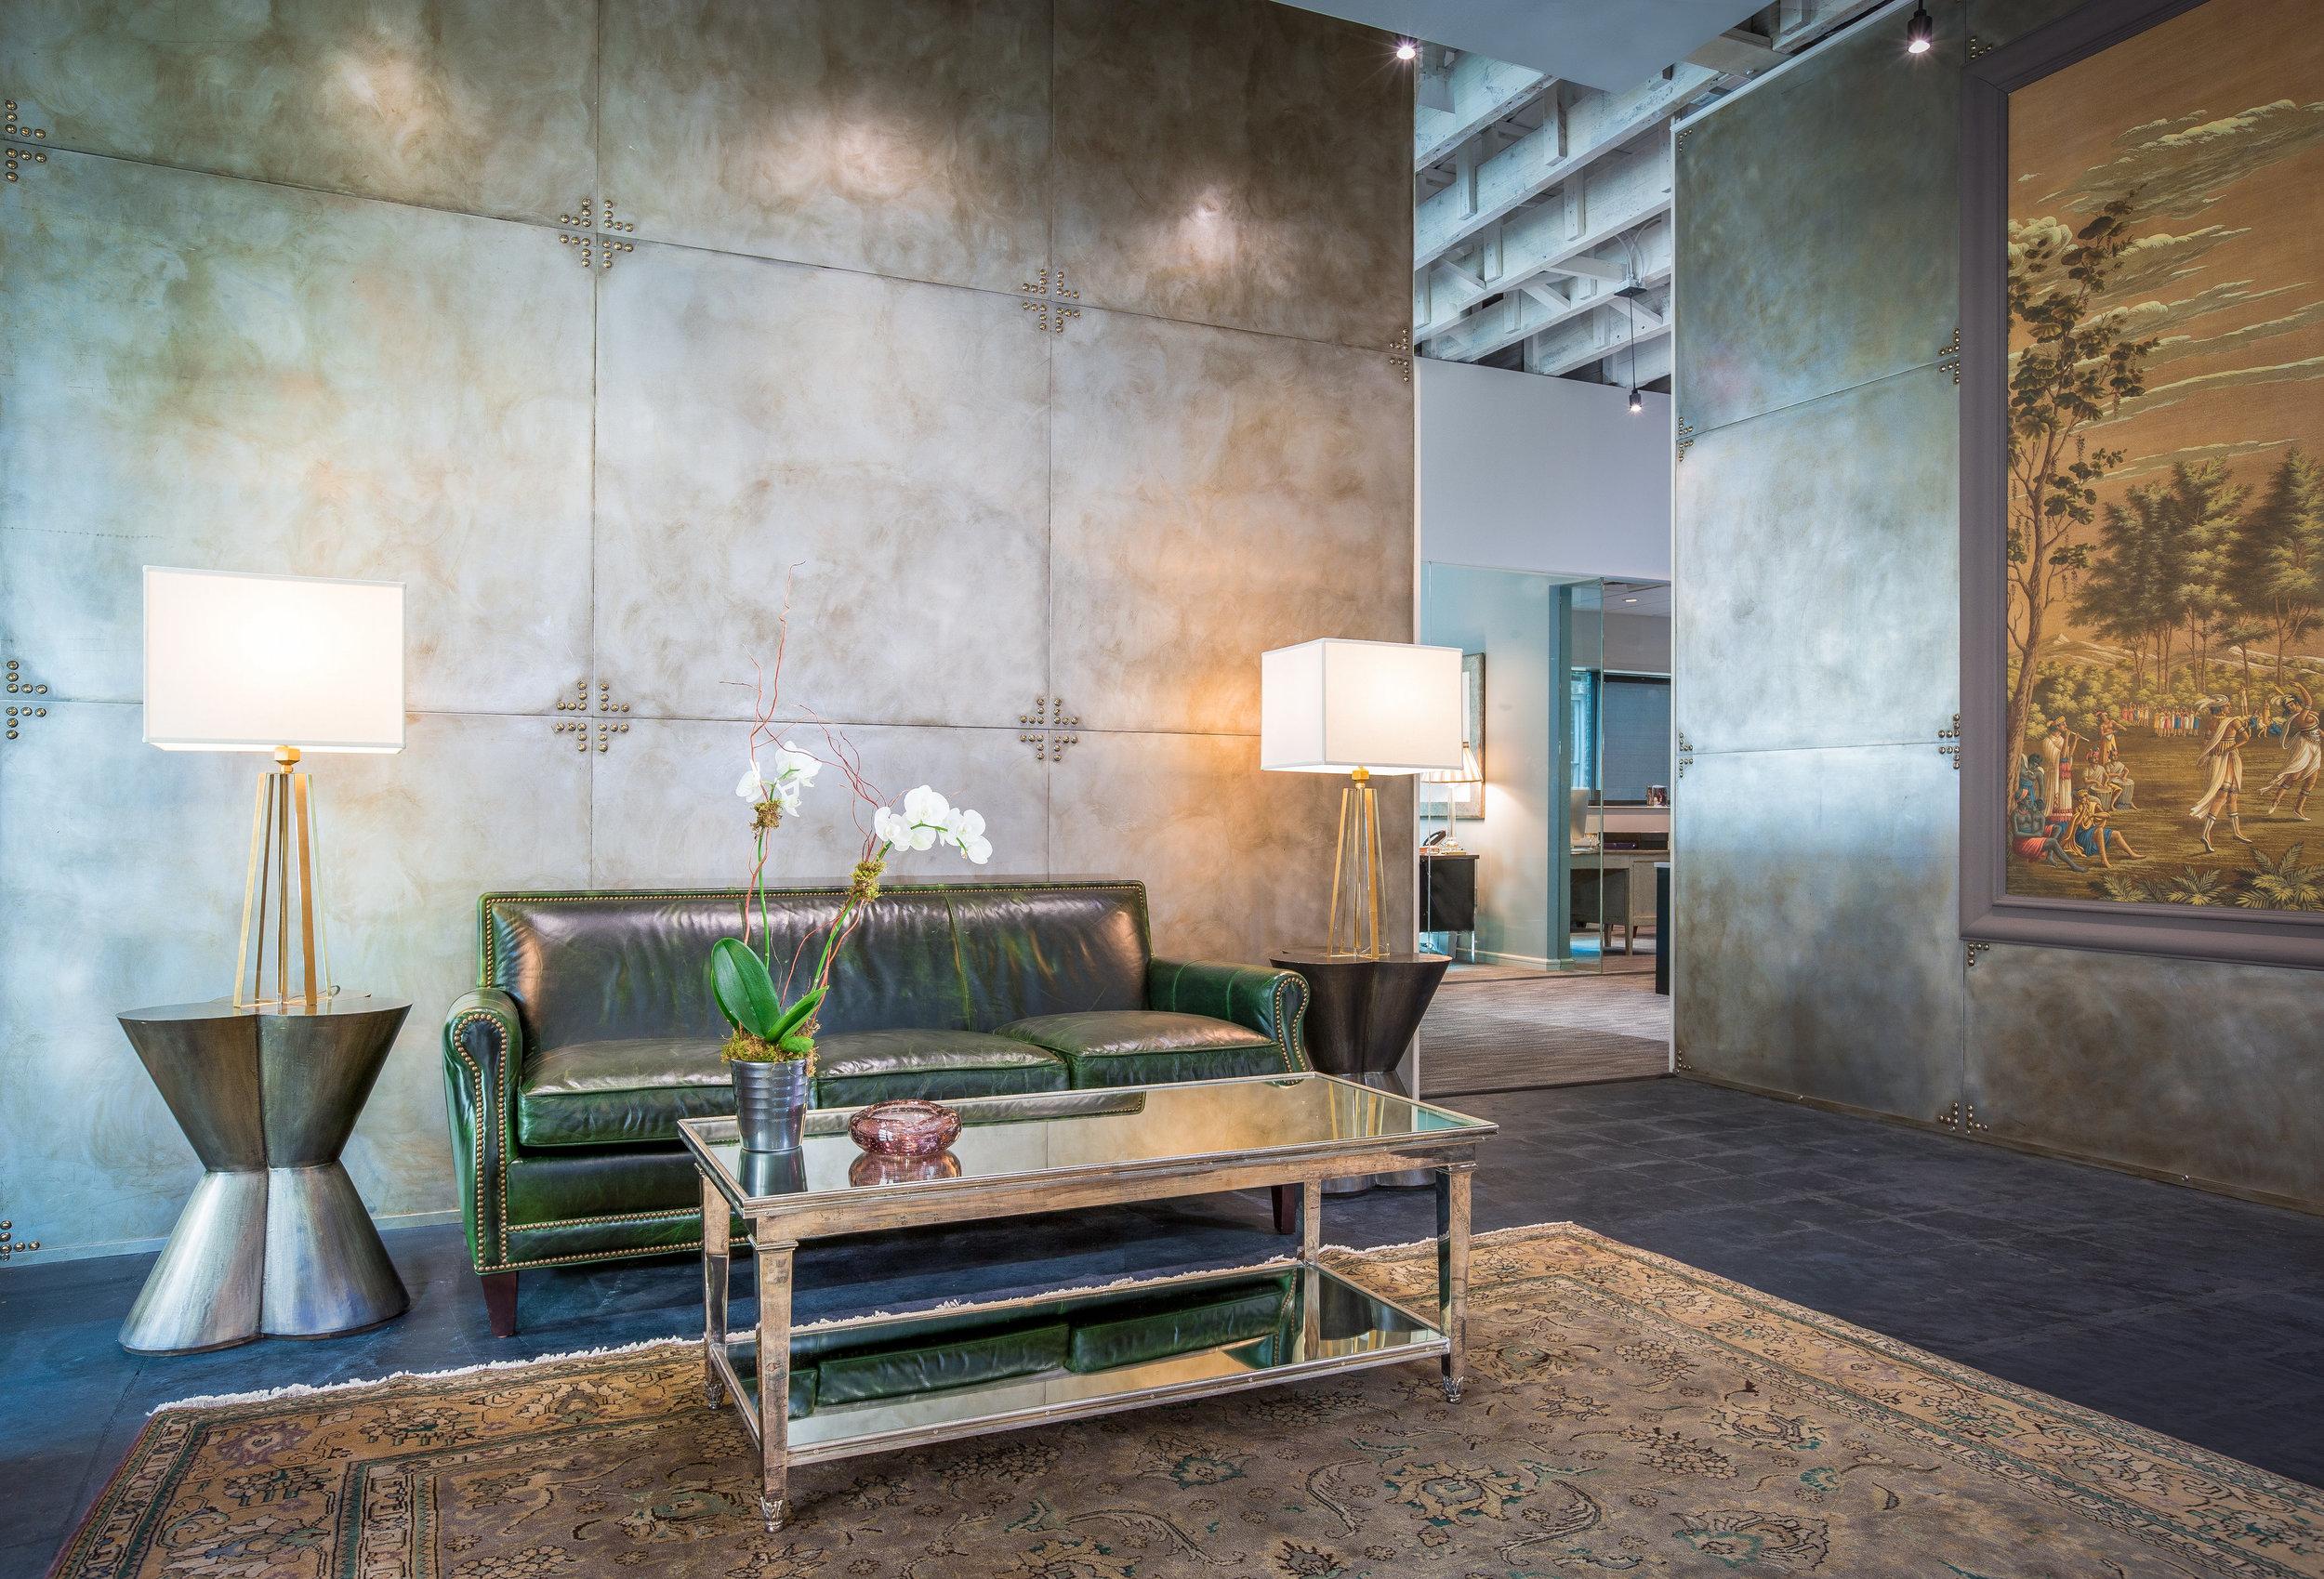 Finished Interior  Photos-0005 (5).jpg